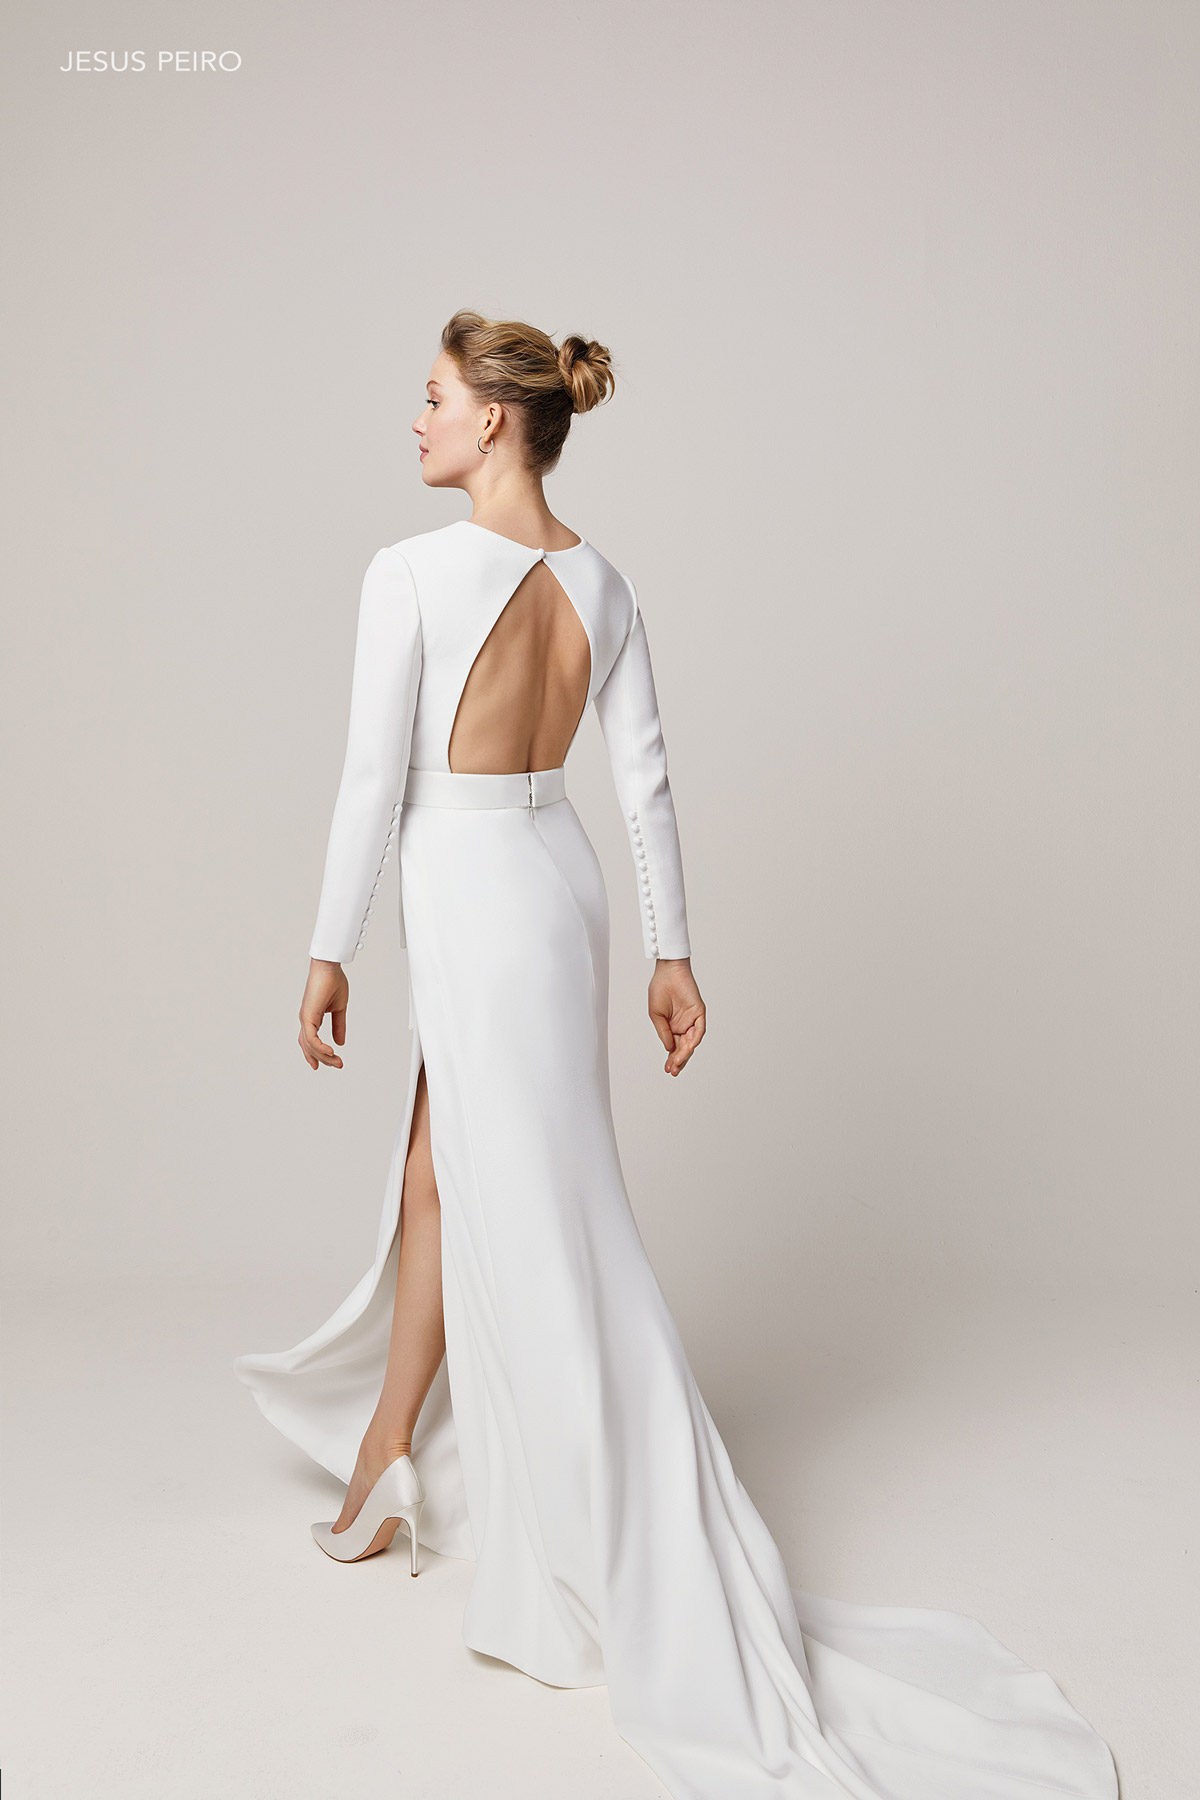 Vestido novia Jesús Peiró Ref.267